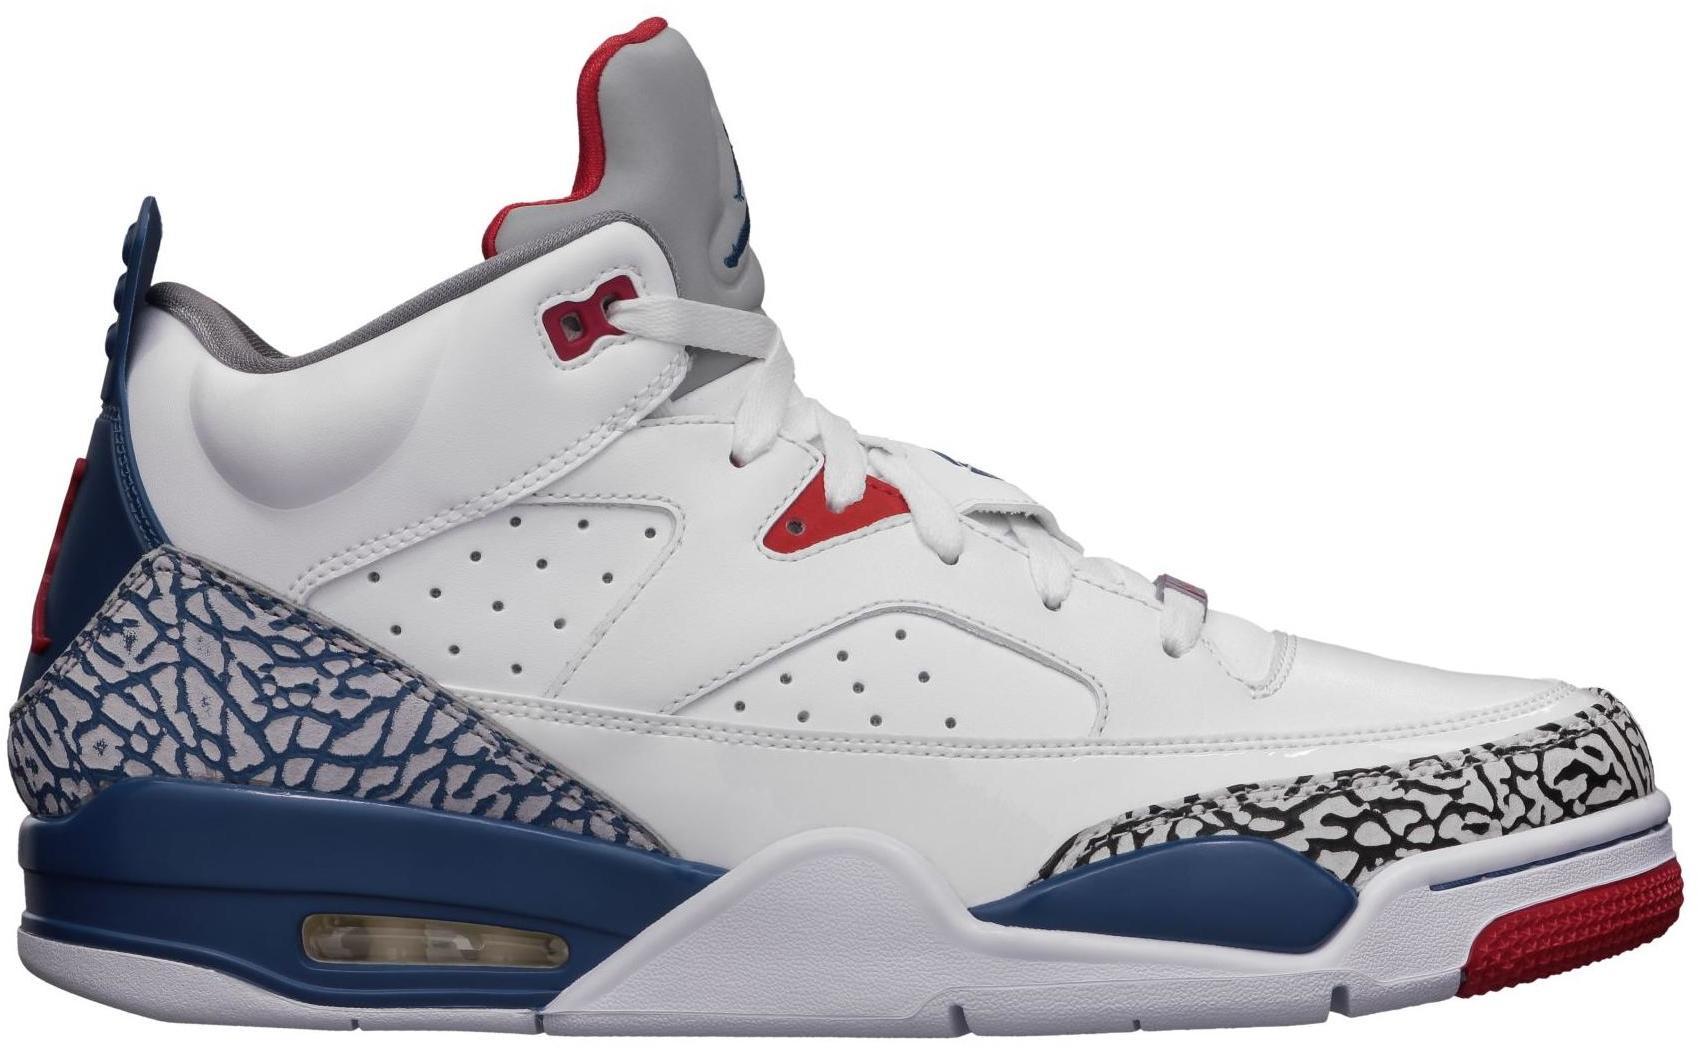 Jordan Son of Mars Low True Blue - 580603-106